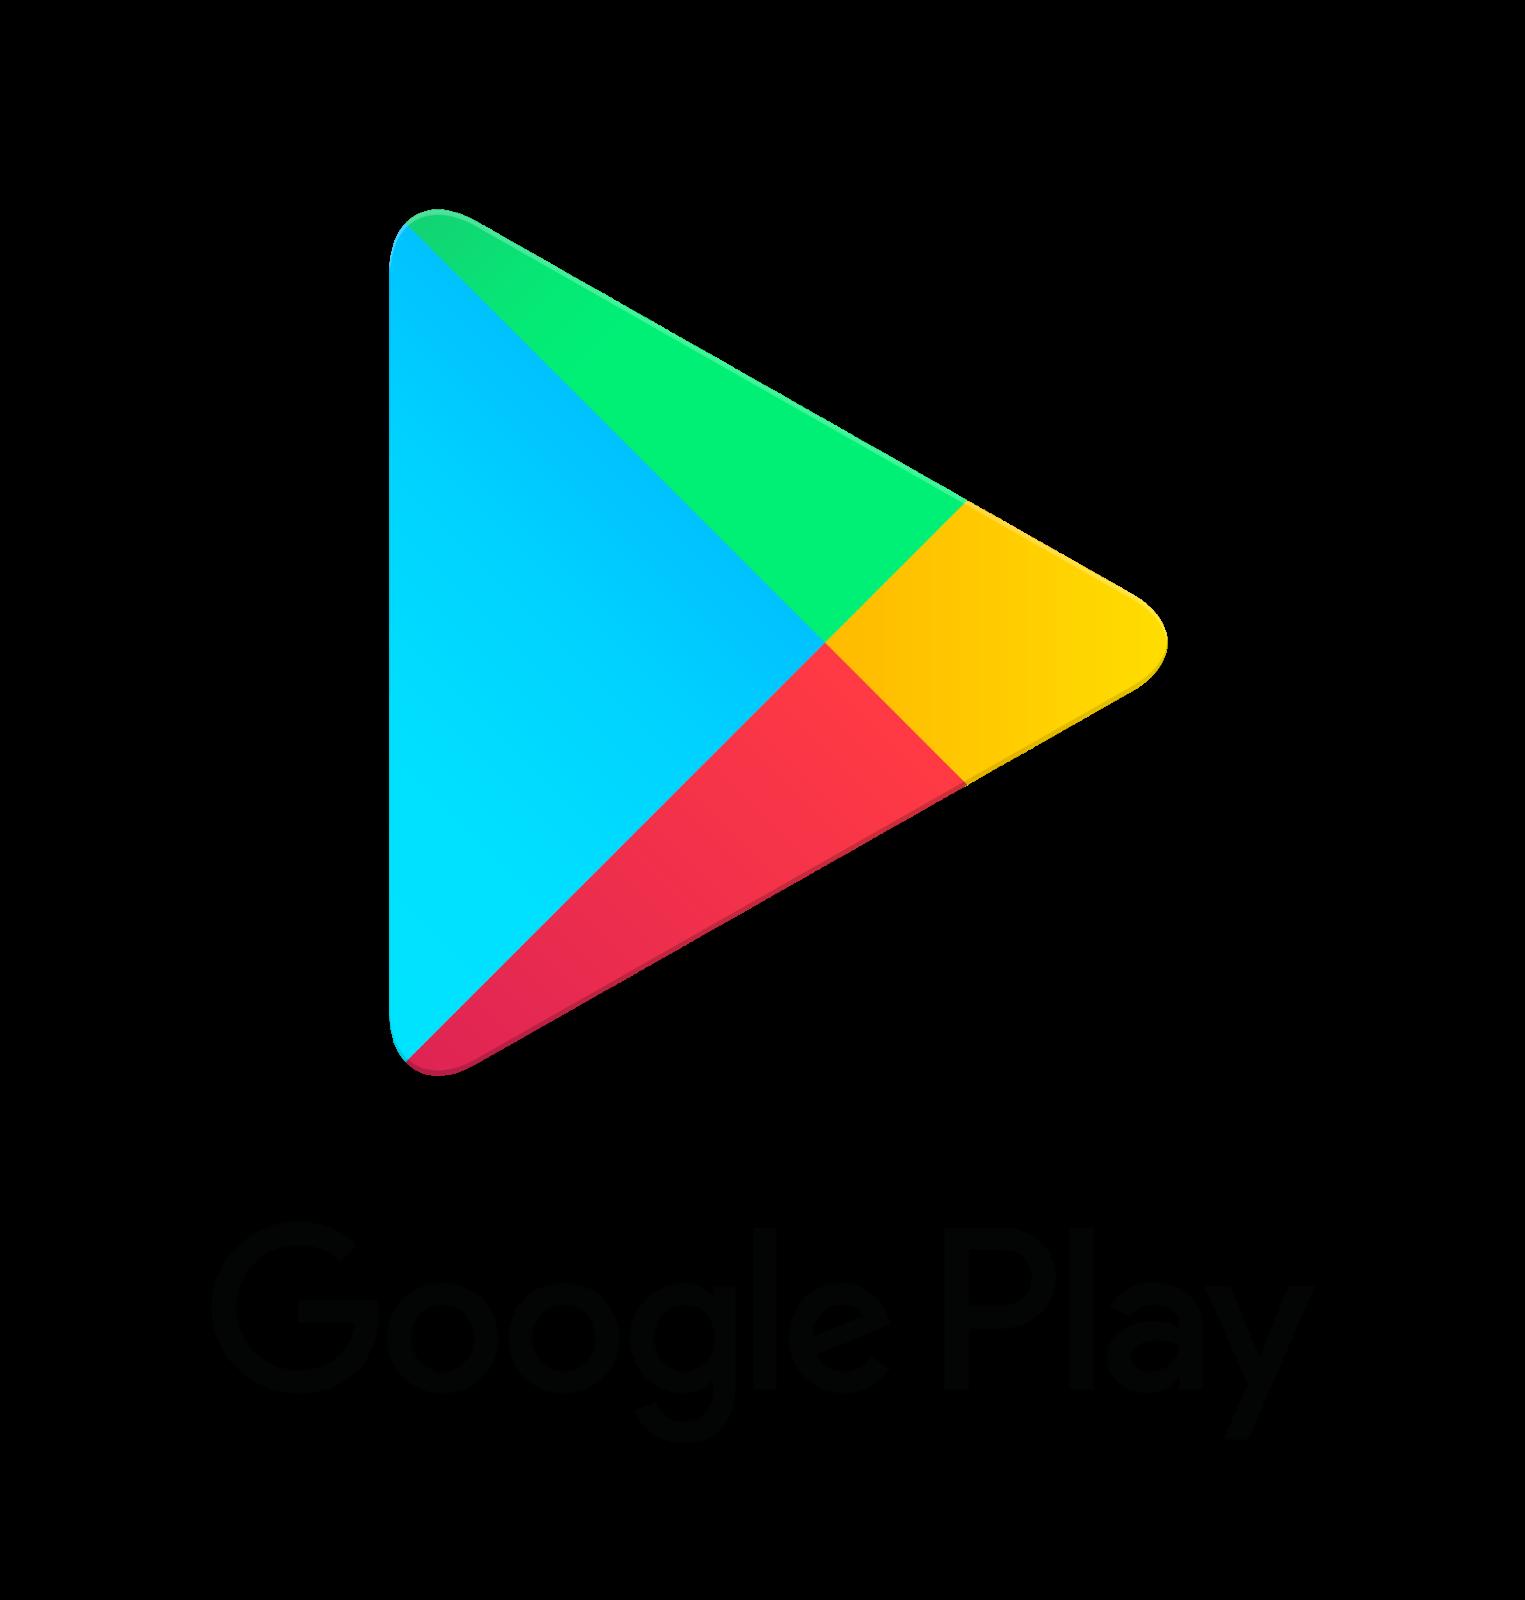 logo google play jpeg